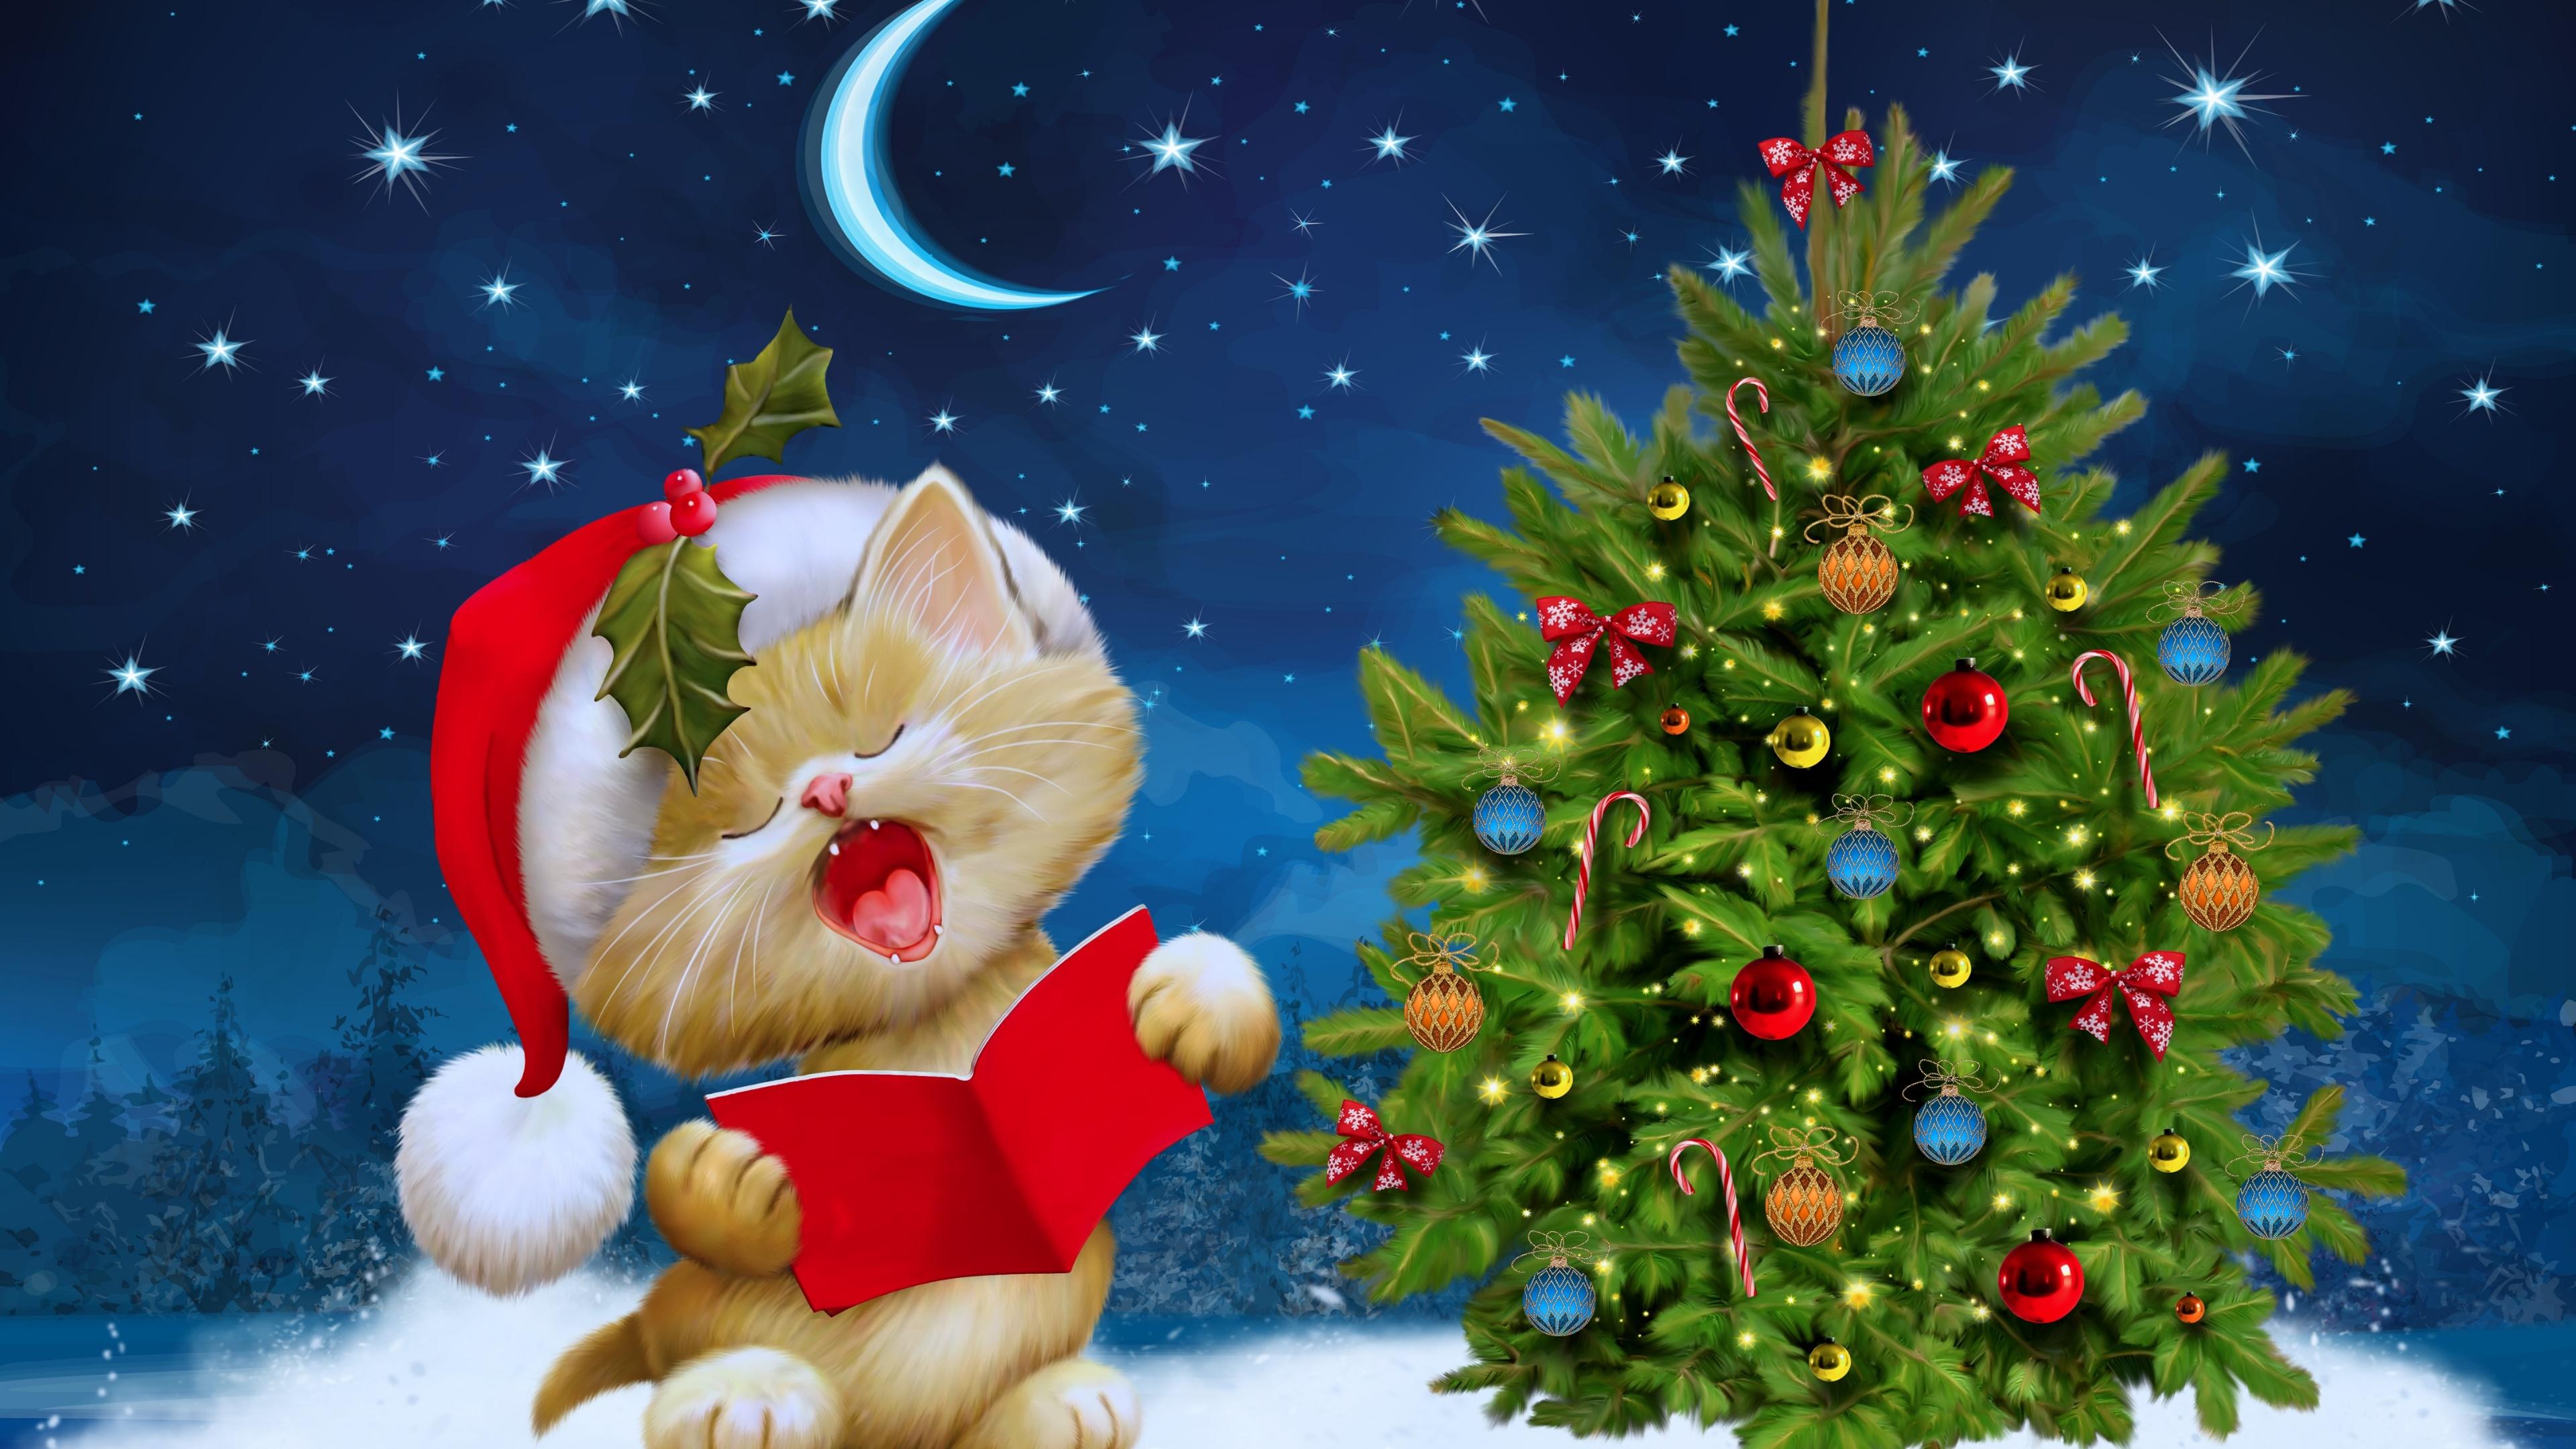 Free Download Christmas Tree Wallpaper 2017